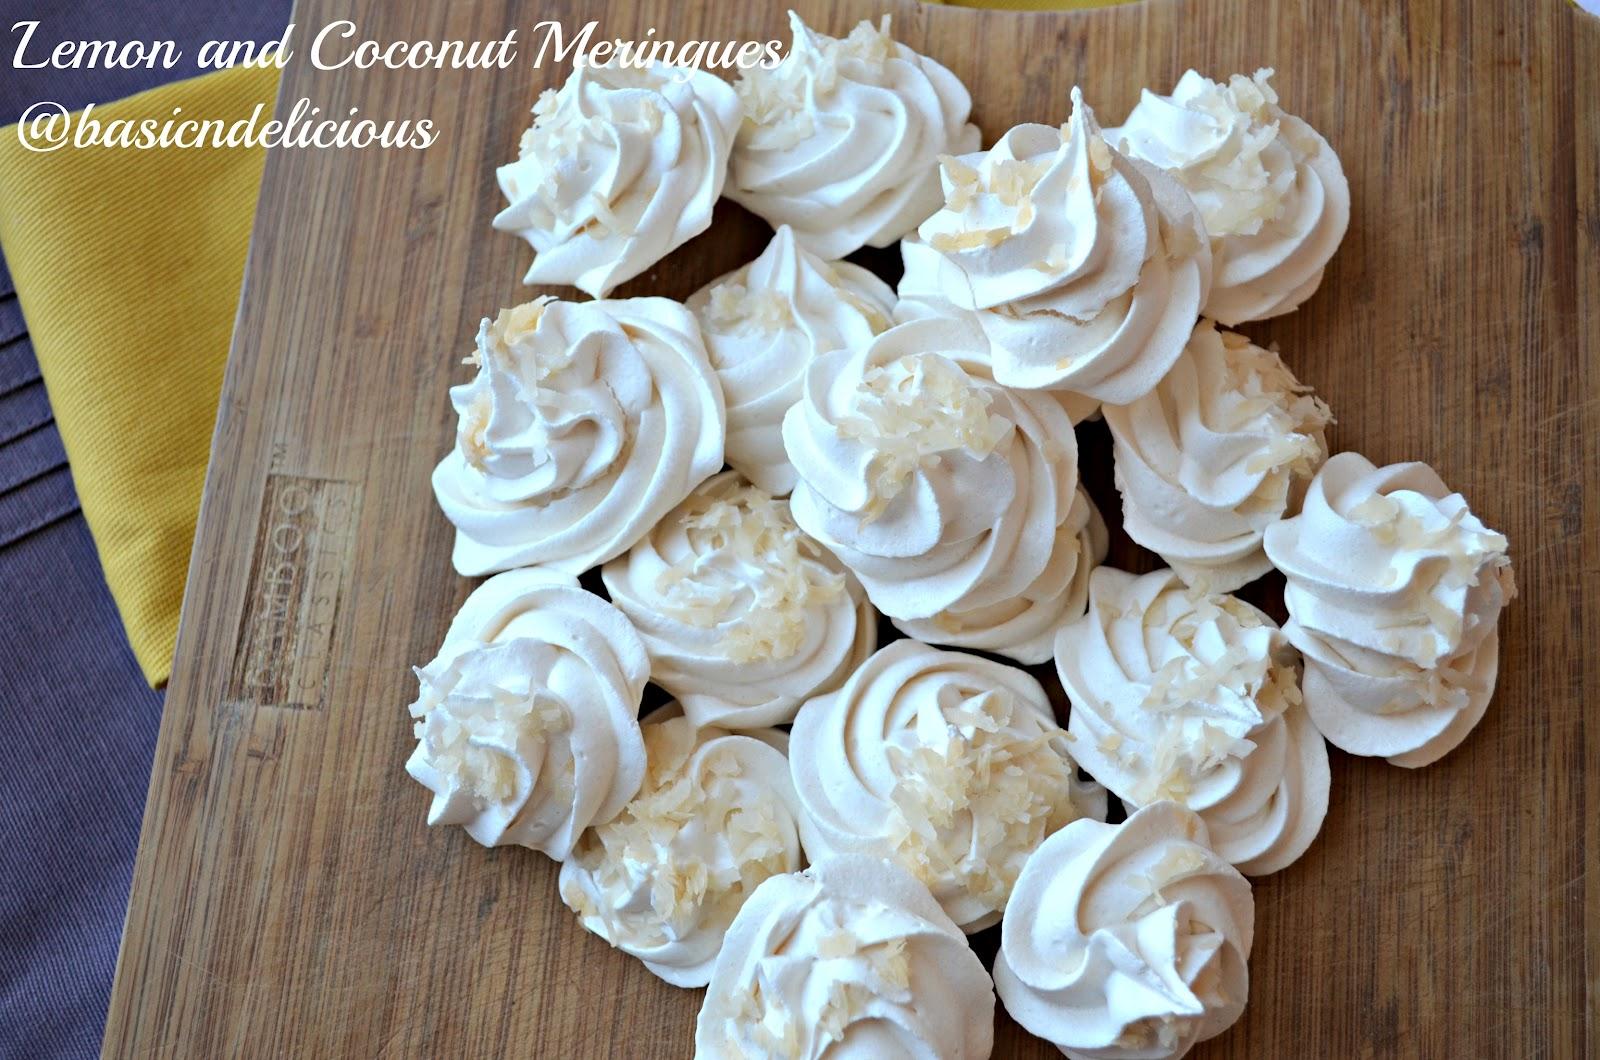 ... coconut meringues 400x400 jpg coconut meringue kisses with chocolate